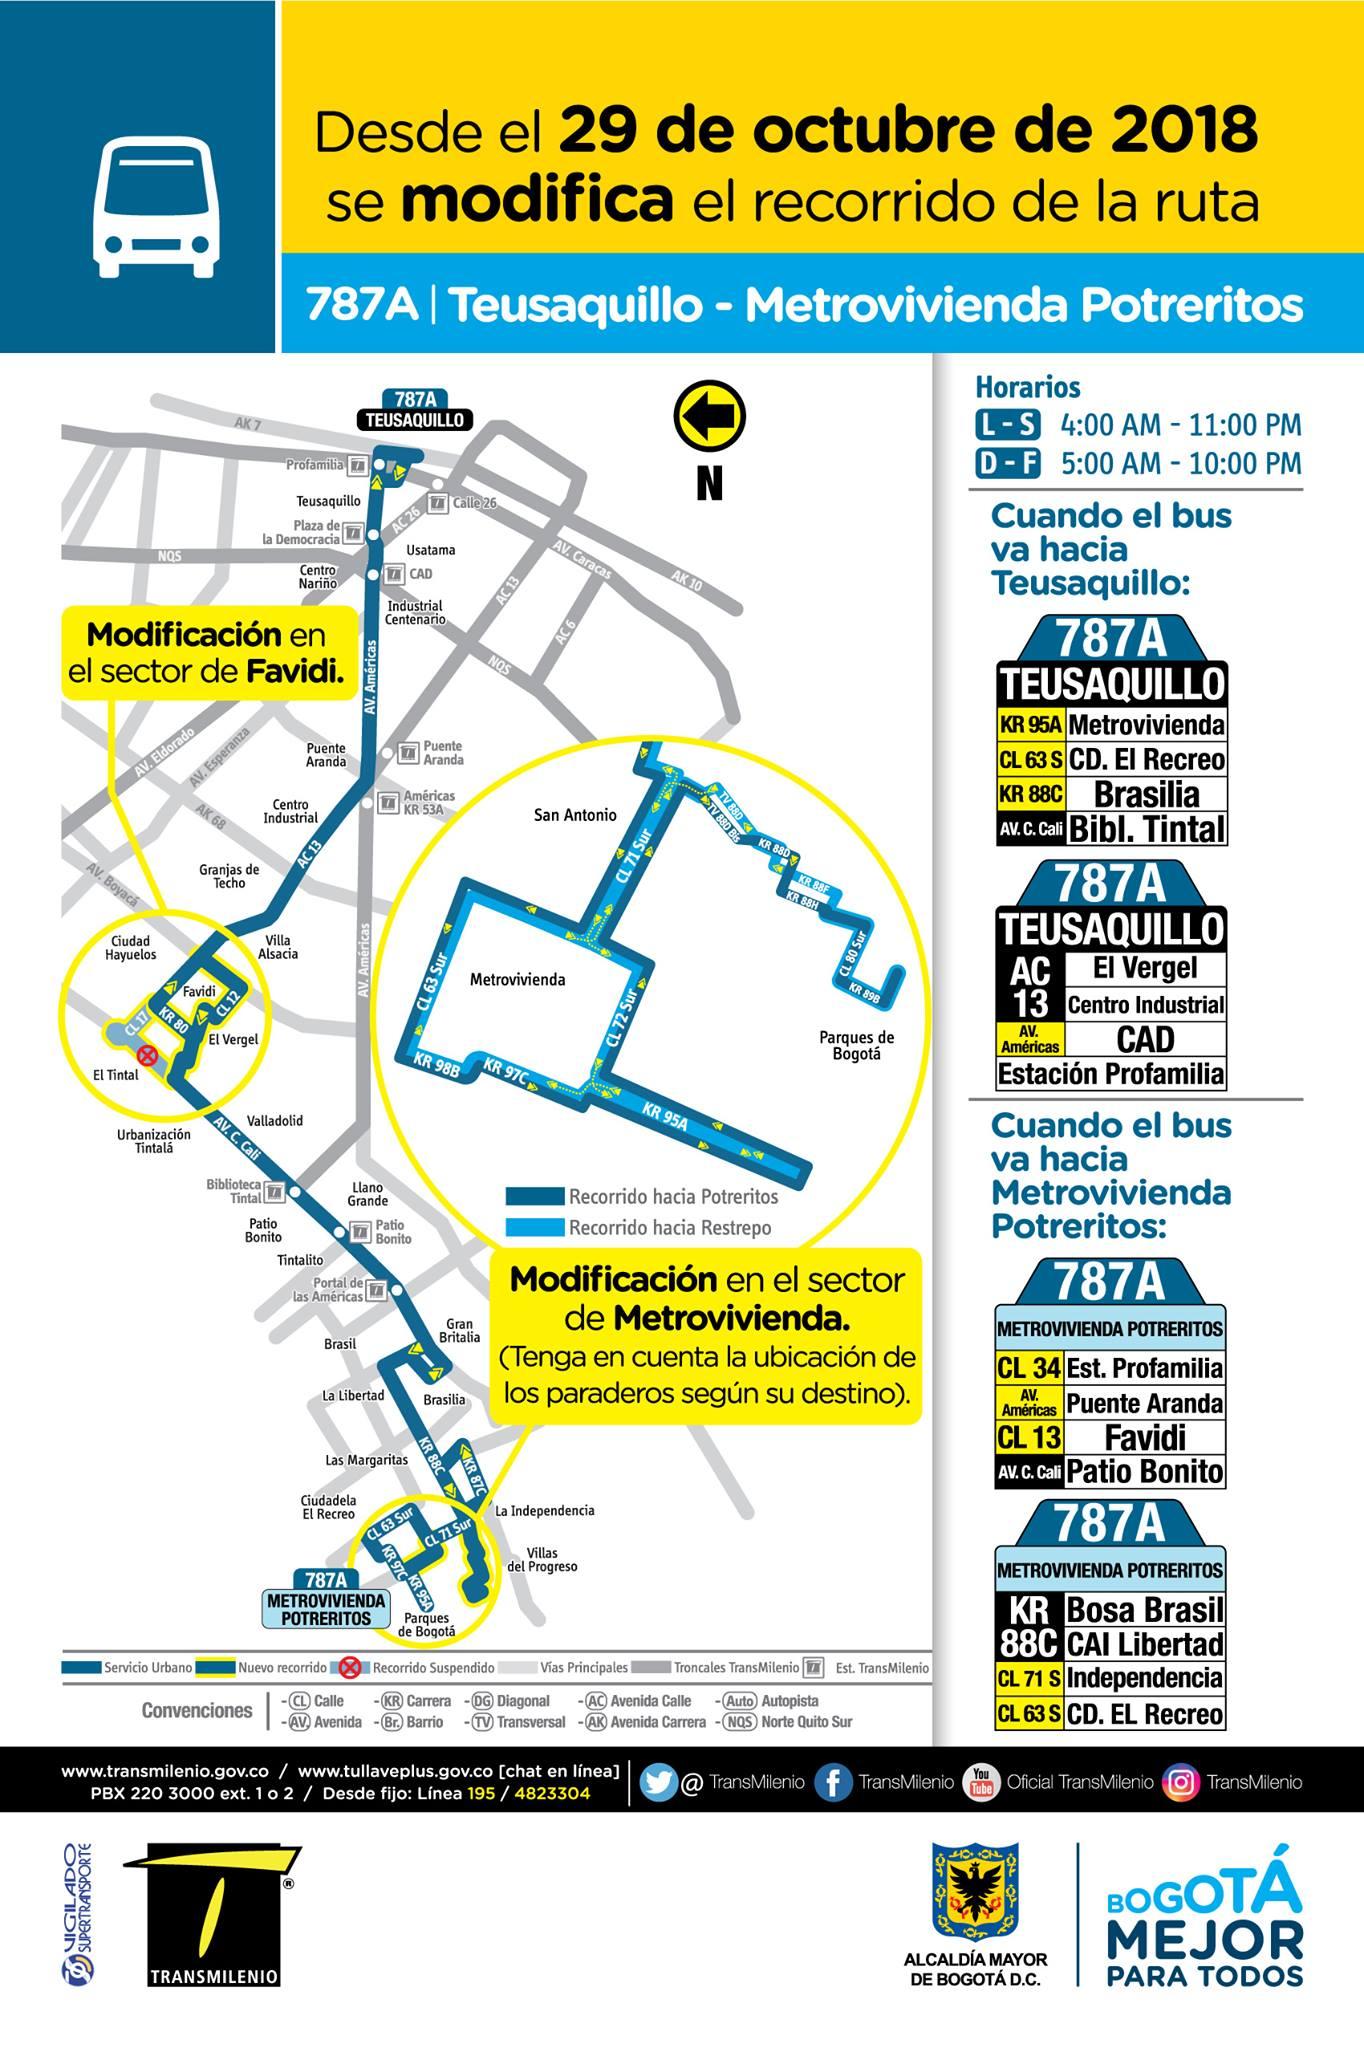 Recorrido ruta C701 >Metrovivienda (Potreritos) - Restrepo